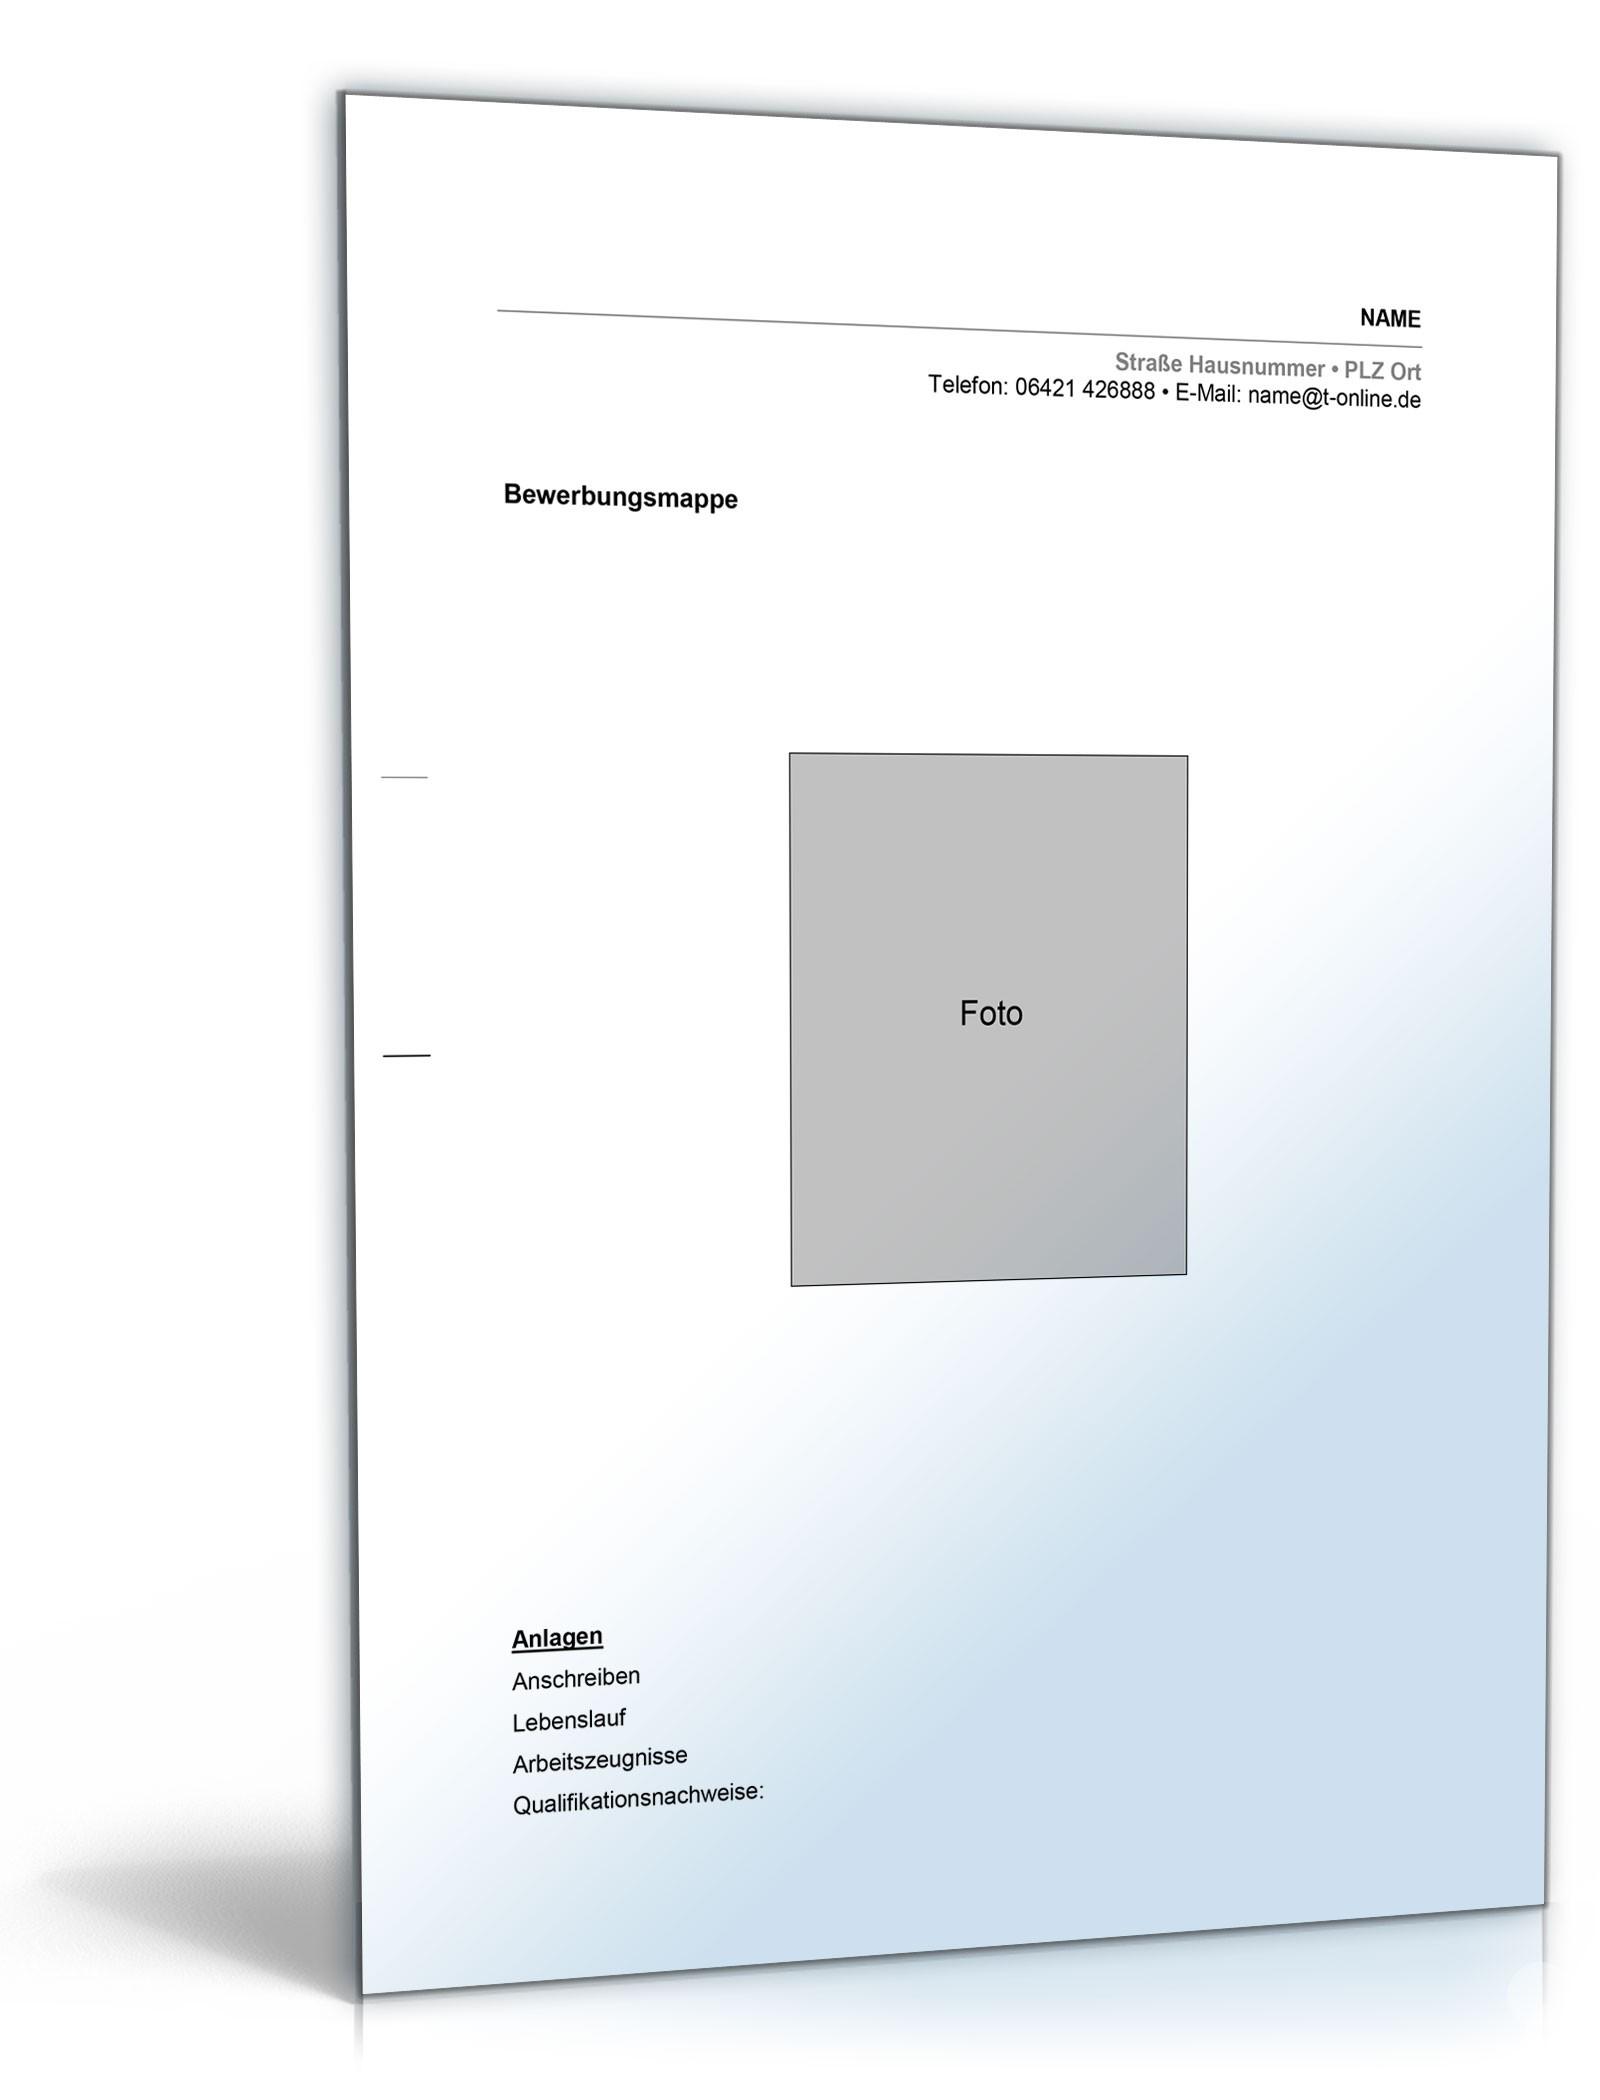 Bäcker Bewerbungs-Paket   Muster zum Download